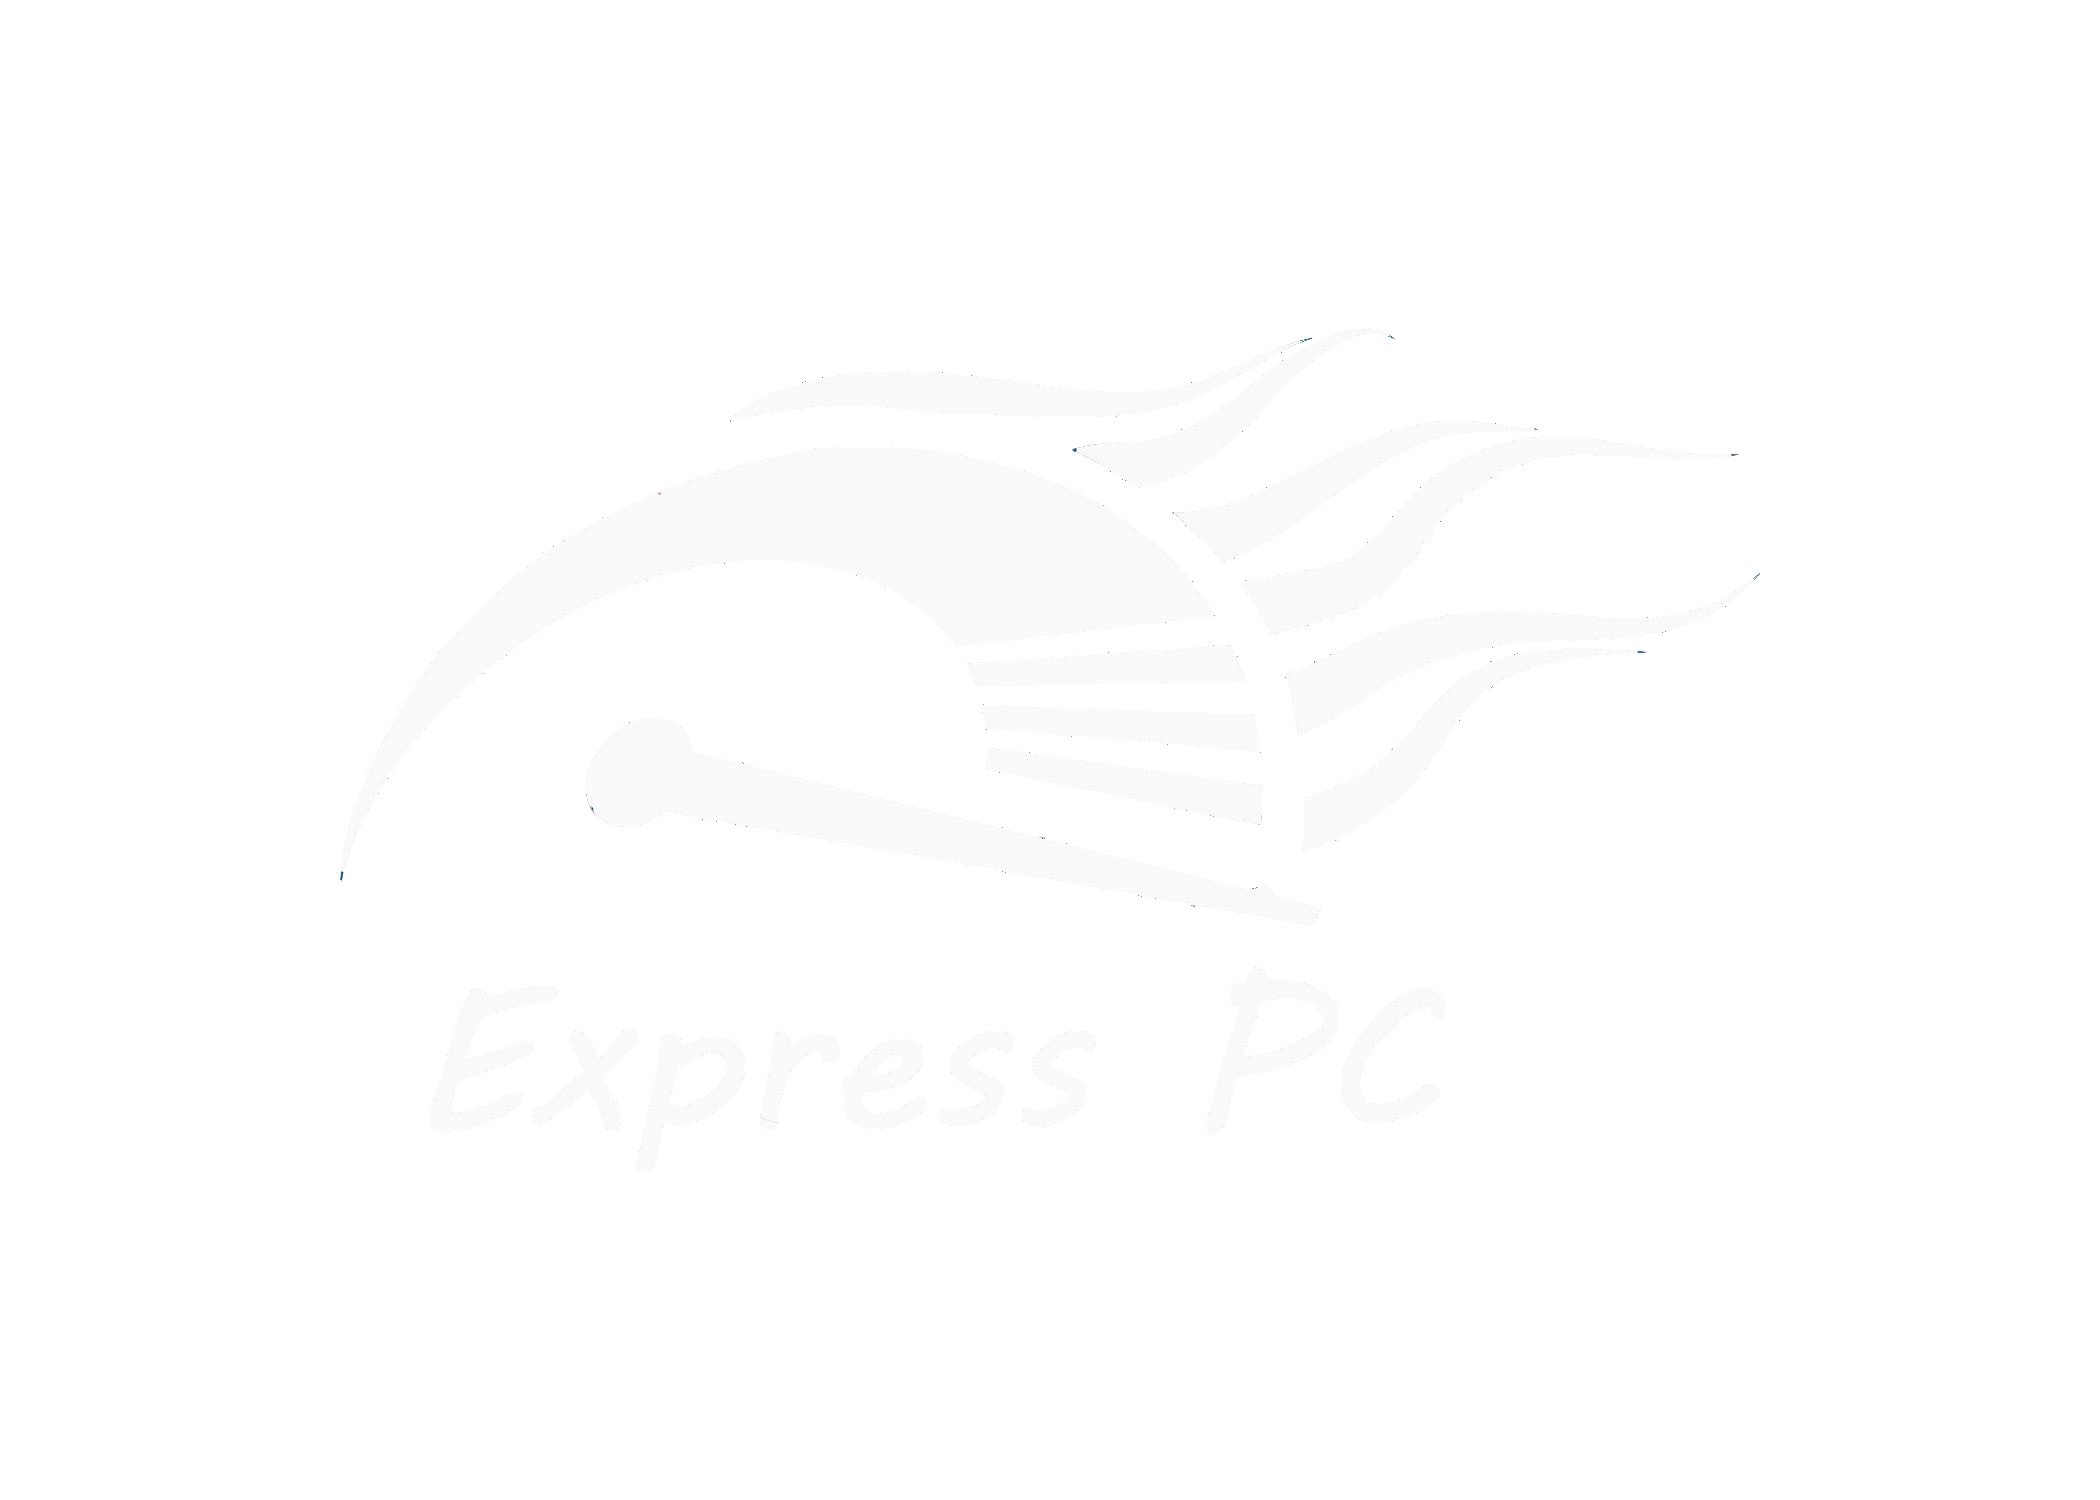 Express PC